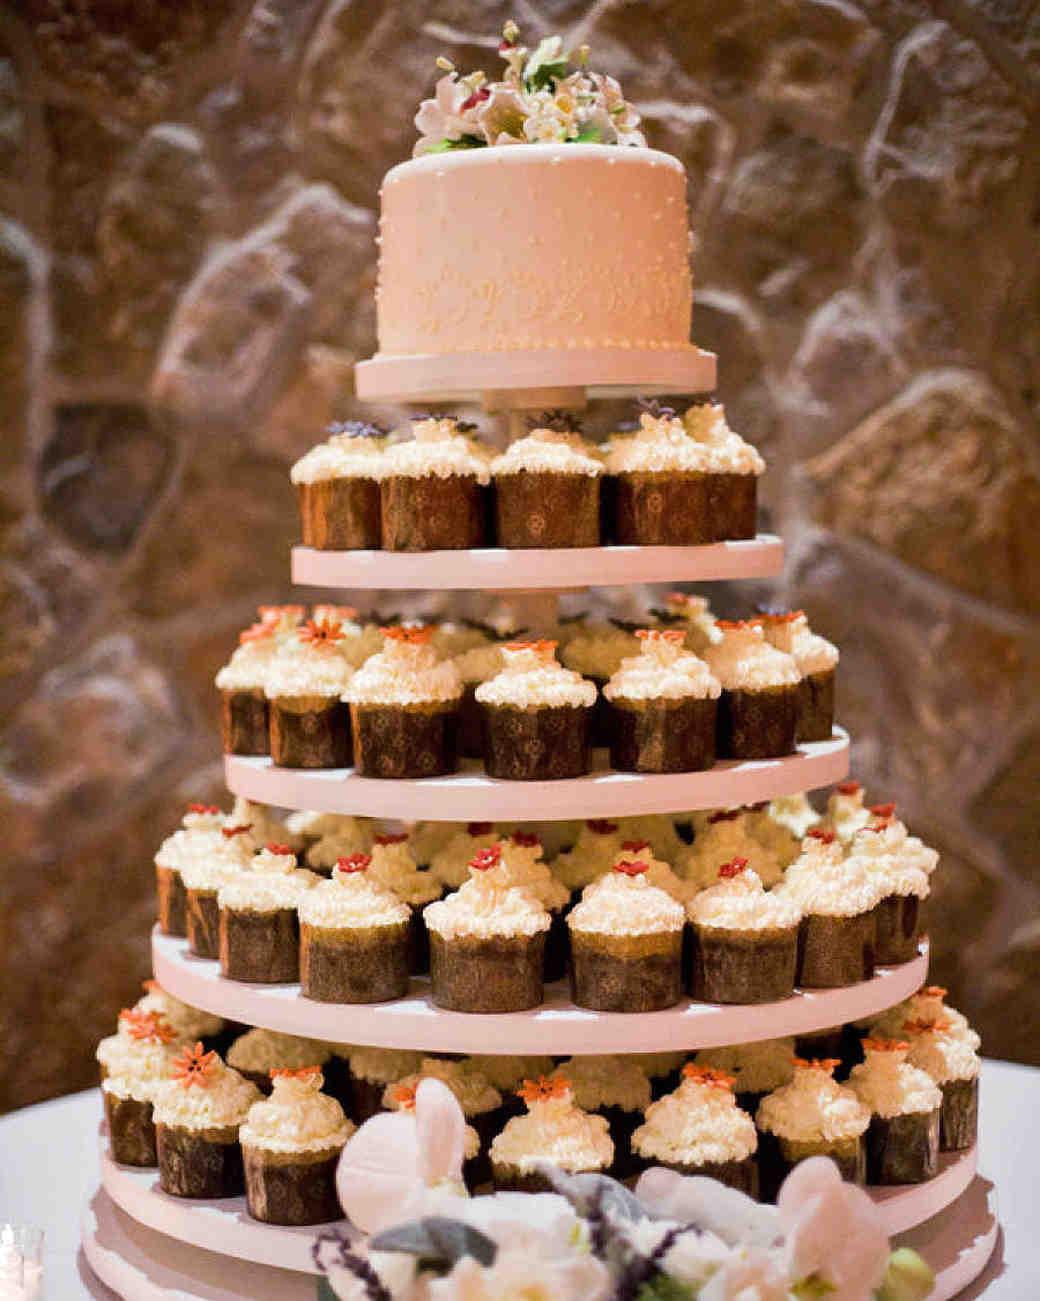 Alternative To Wedding Cakes  24 Delicious Wedding Cake Alternatives